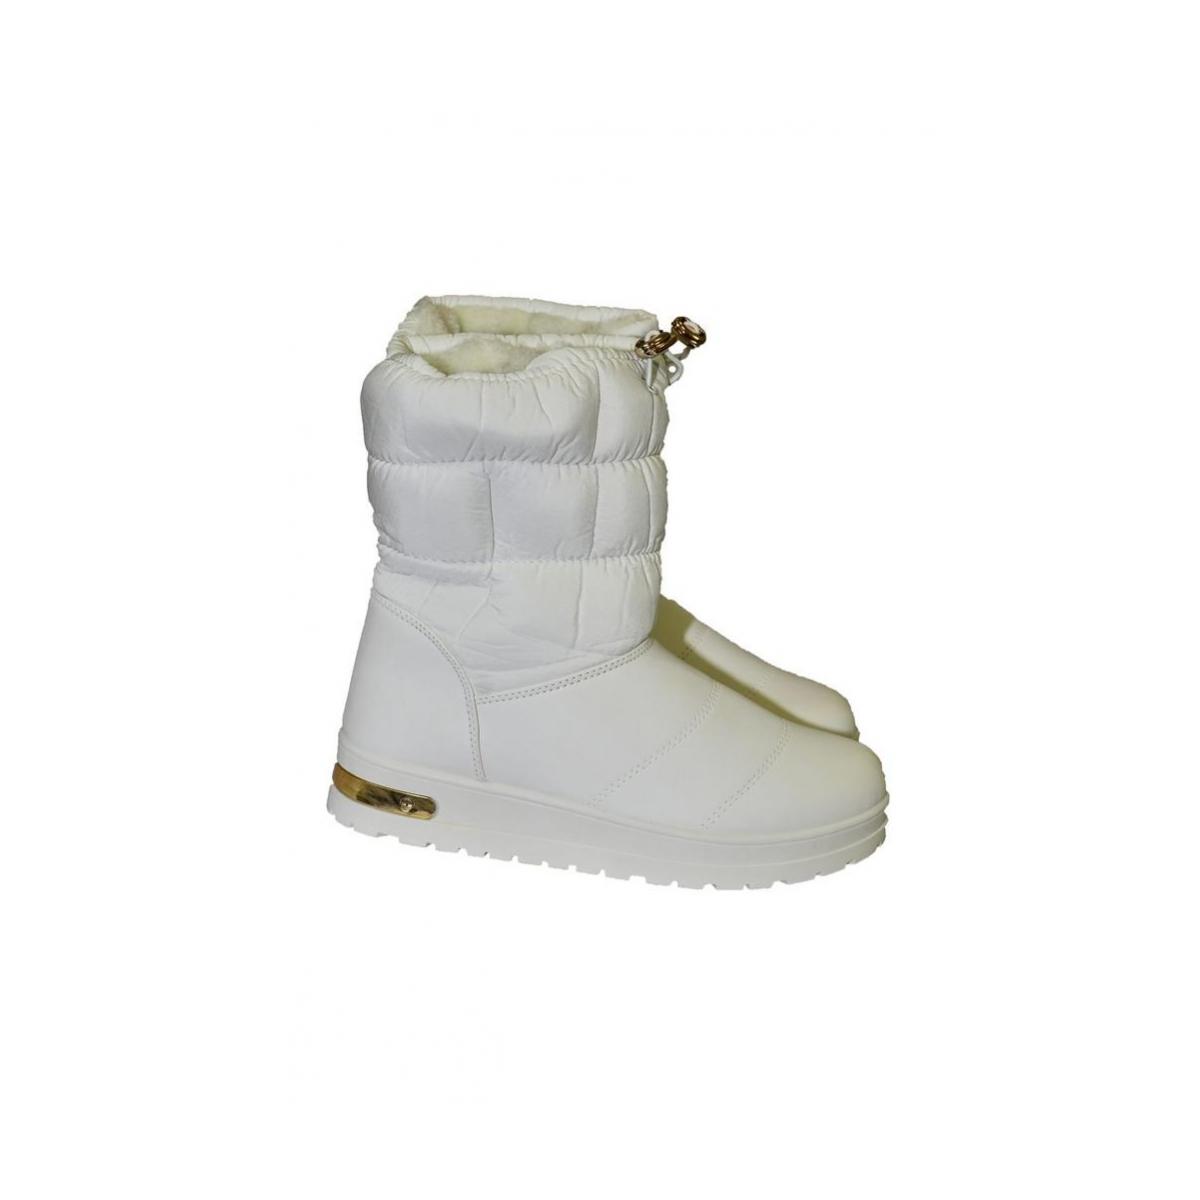 a4184b3210 Dámske biele čižmy SARA - 2